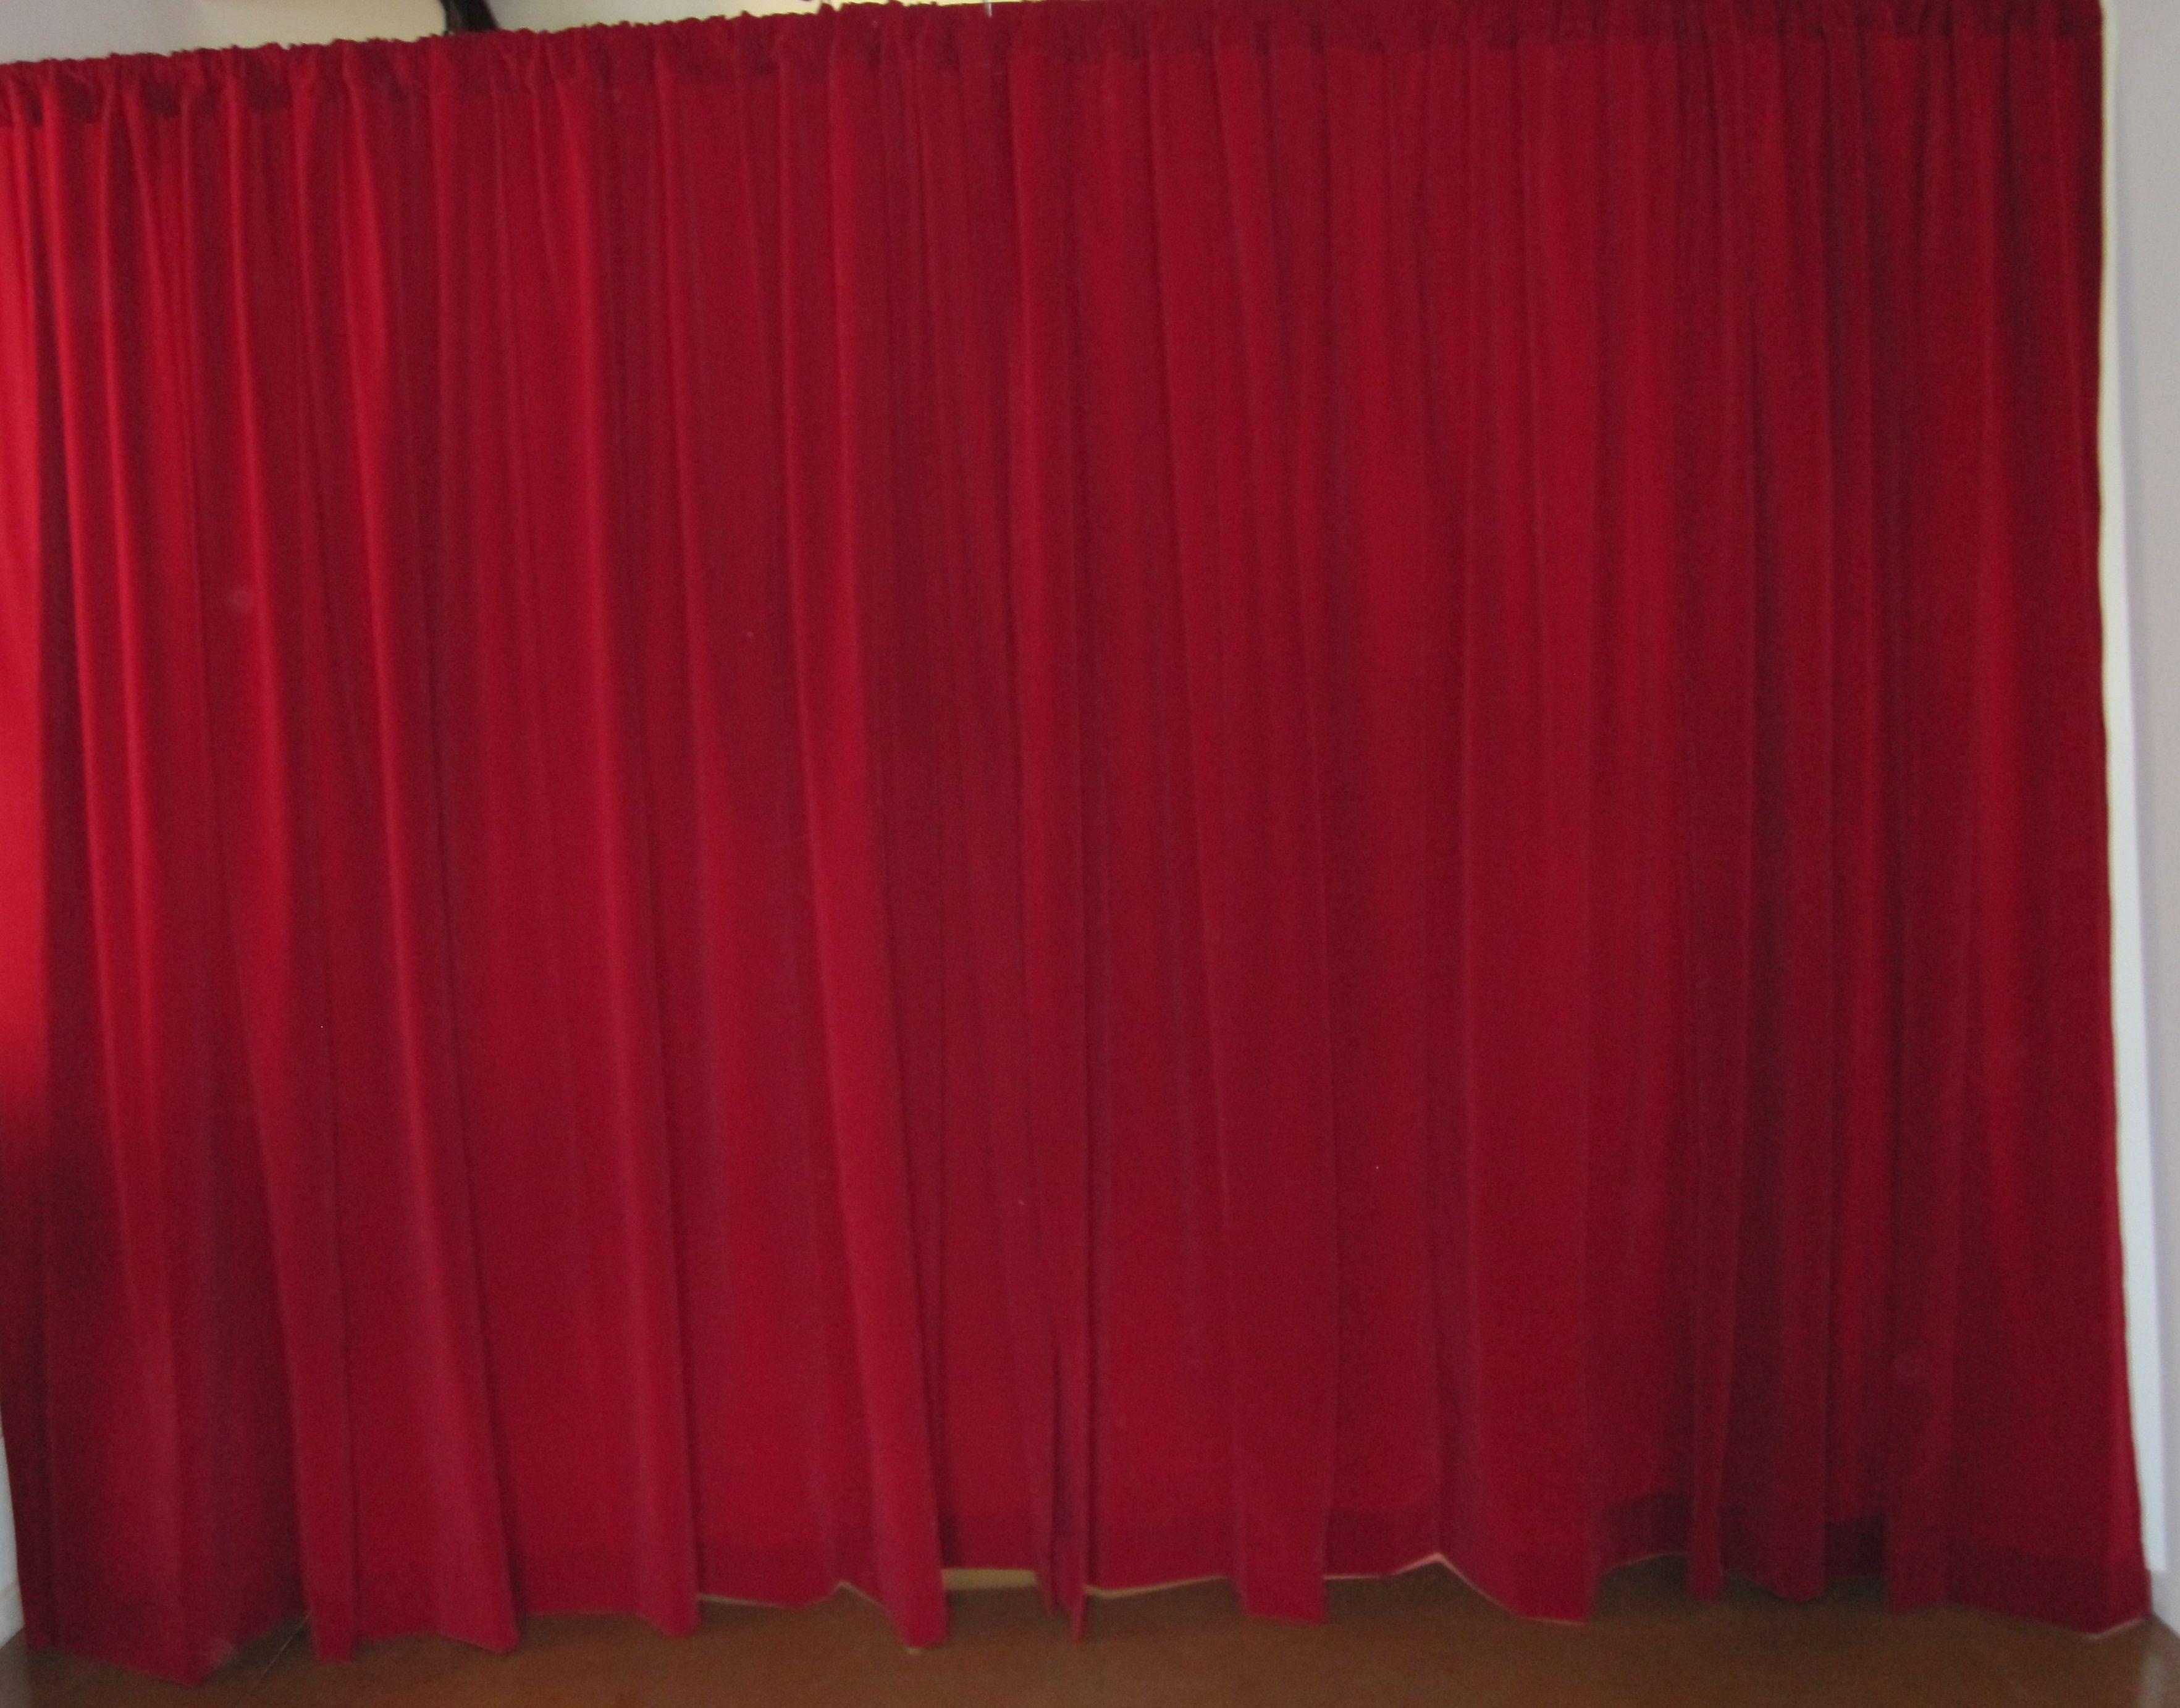 panel velvet walmart dark photos of curtain blackout throughout red energy curtains efficient